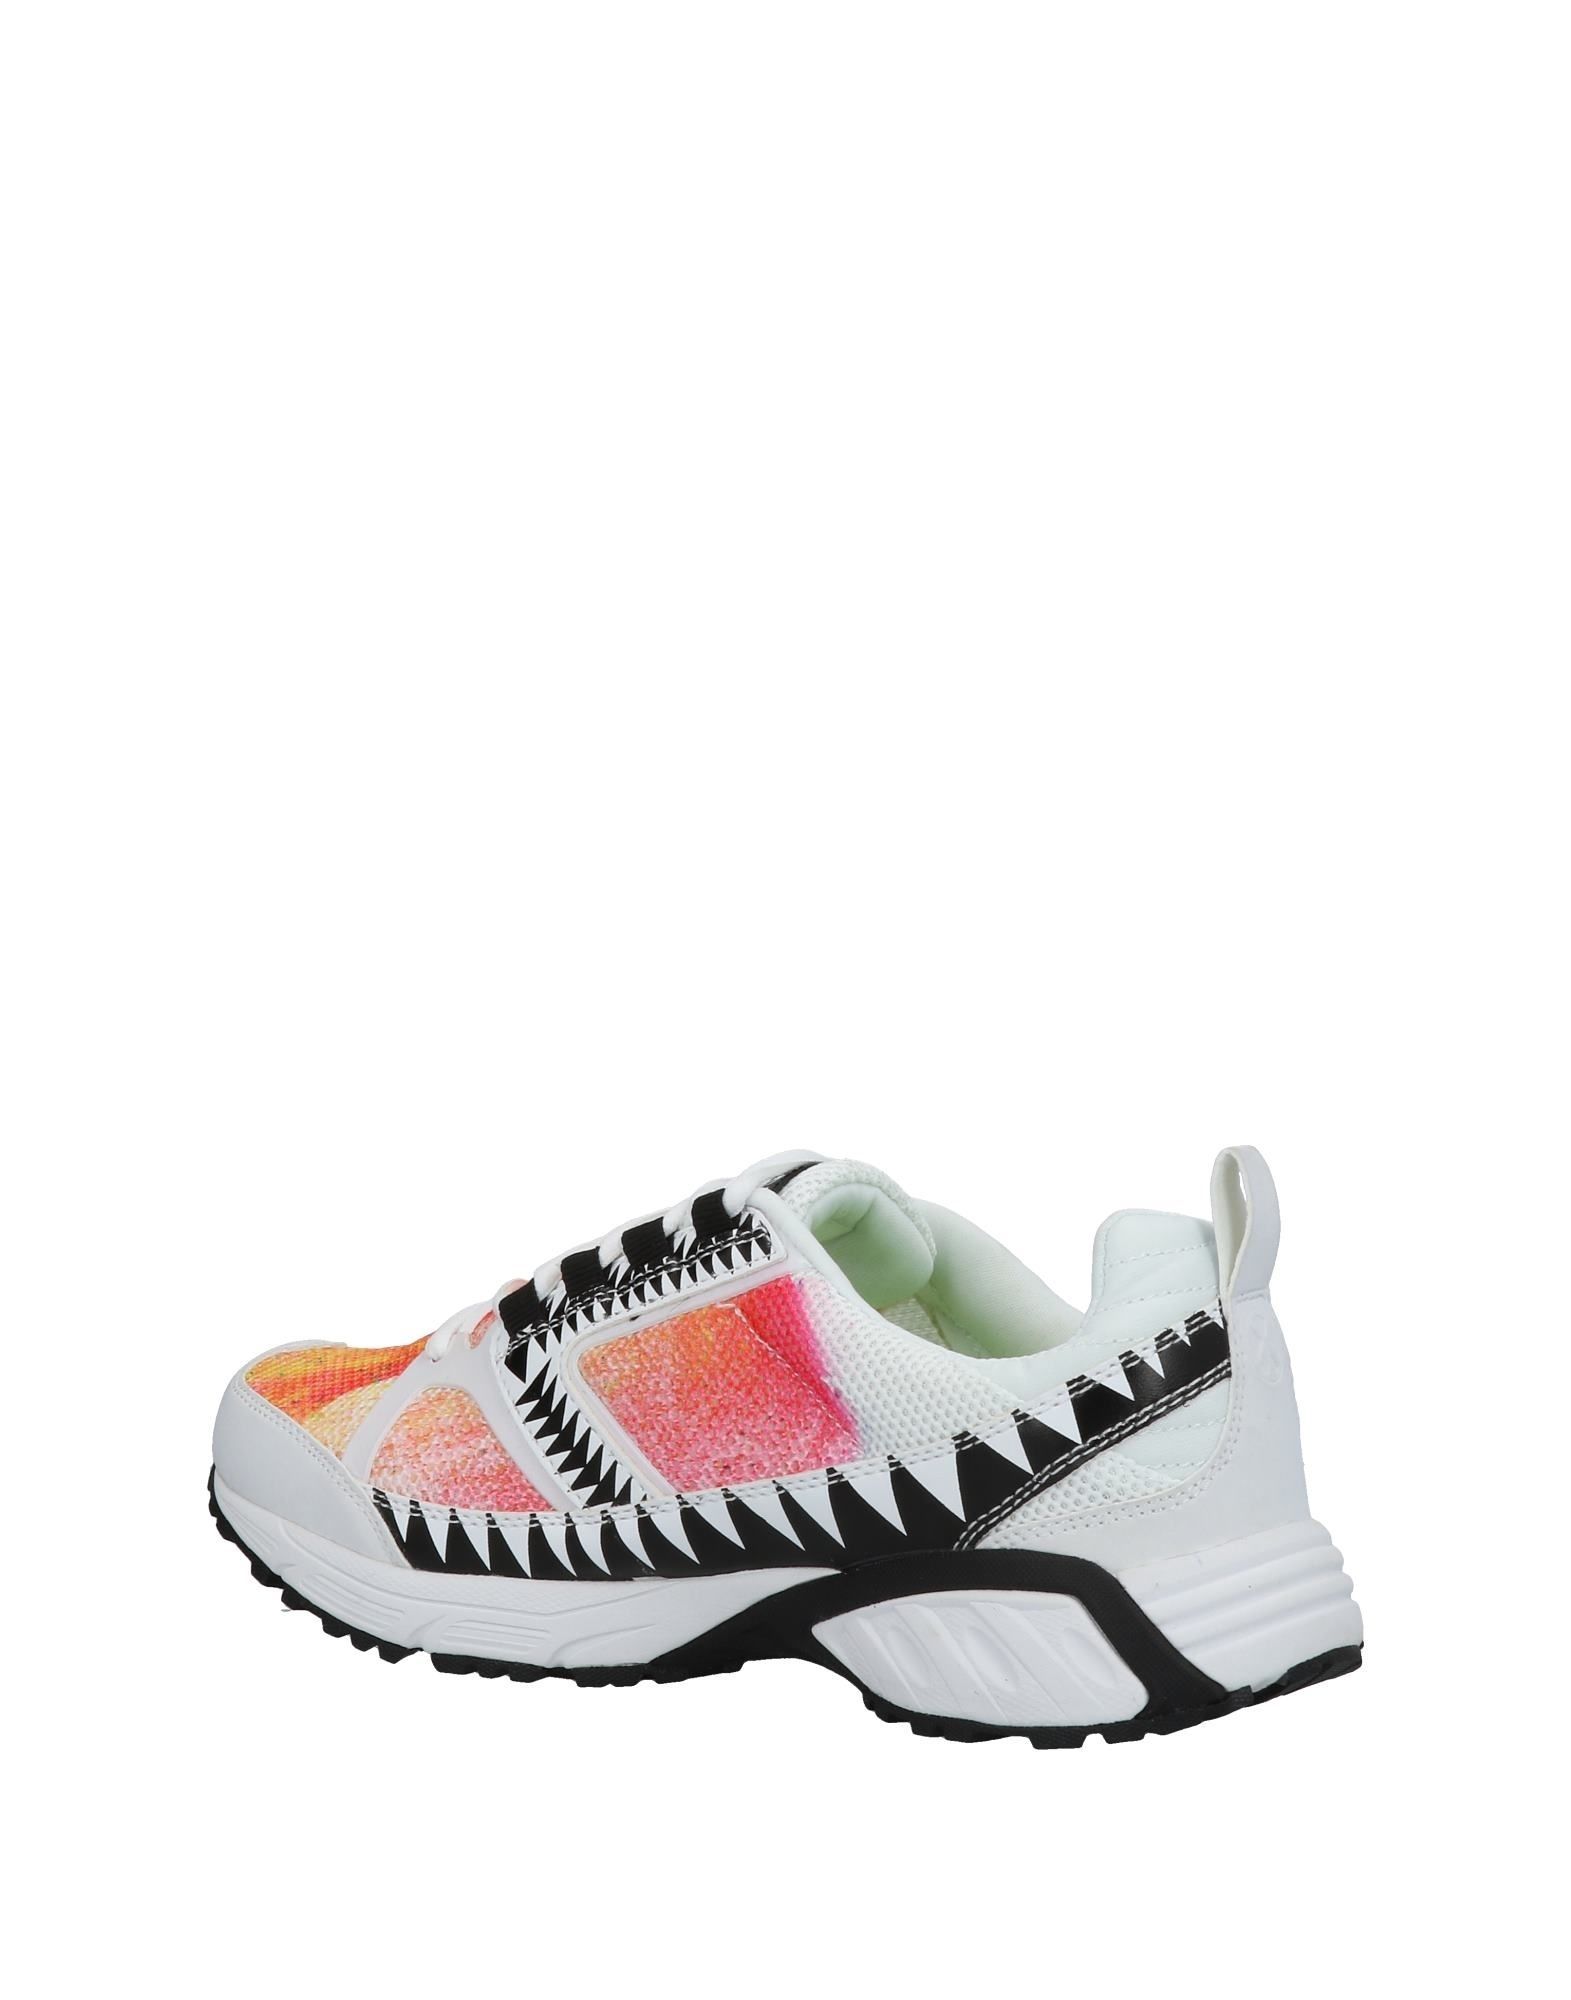 Strd By Volta Footwear Sneakers Herren  11433401RI Heiße Schuhe